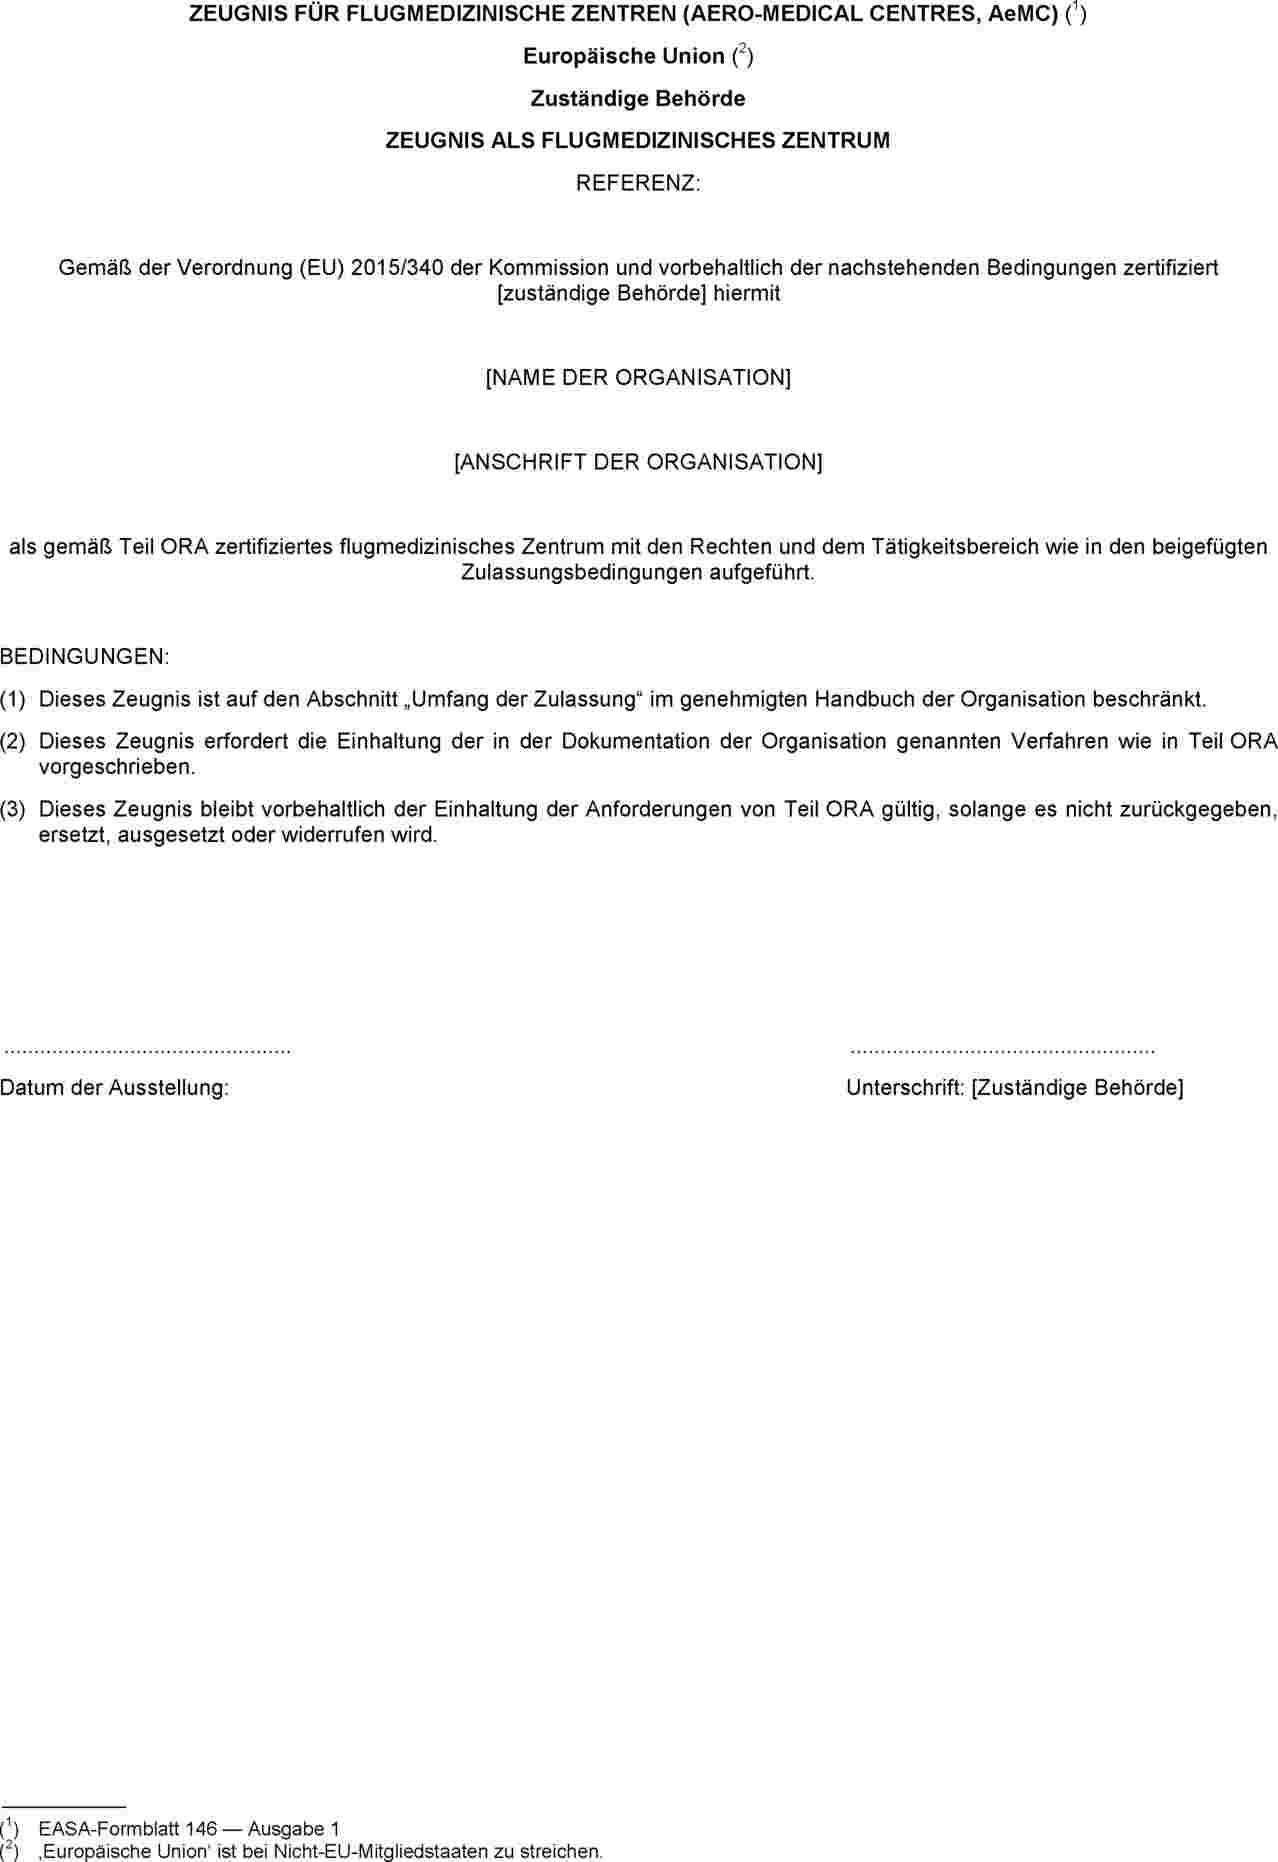 Großzügig Skill Abschnitt Fortsetzen Ideen - Entry Level Resume ...